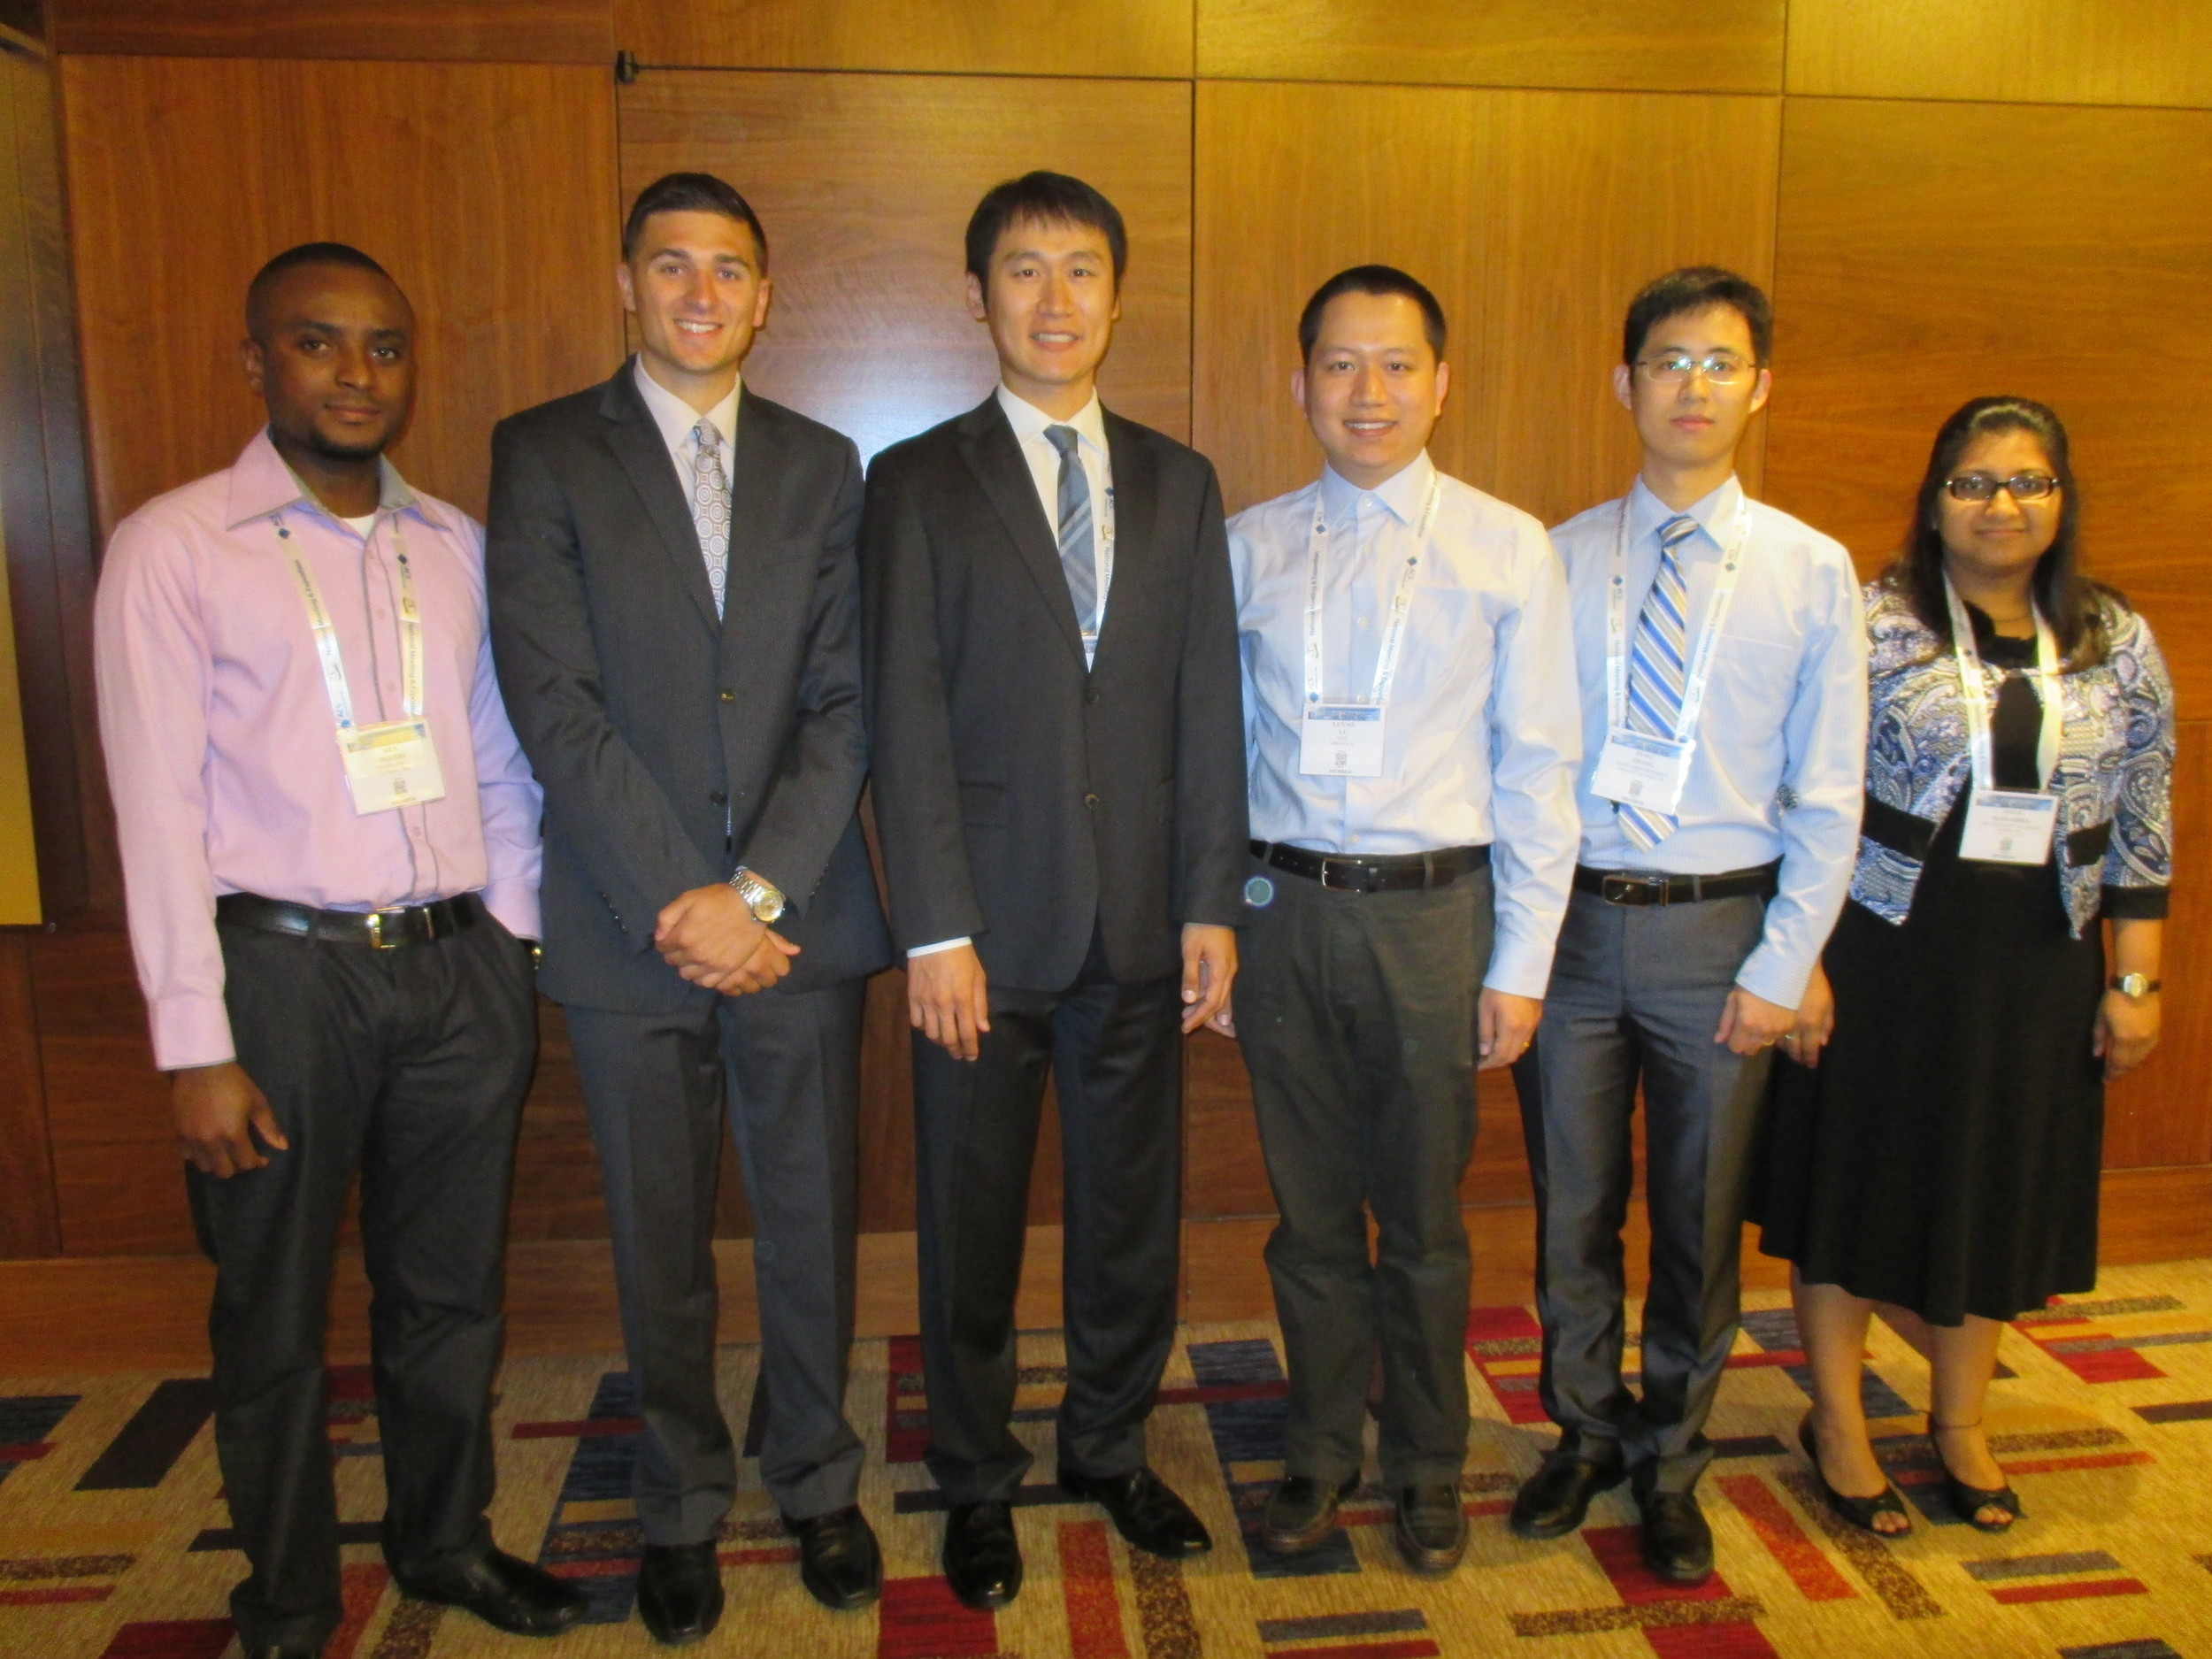 ACS Award - Eastman Chemical Student Award, Finalist (Top 6), PMSEBoston, MA, August 2015